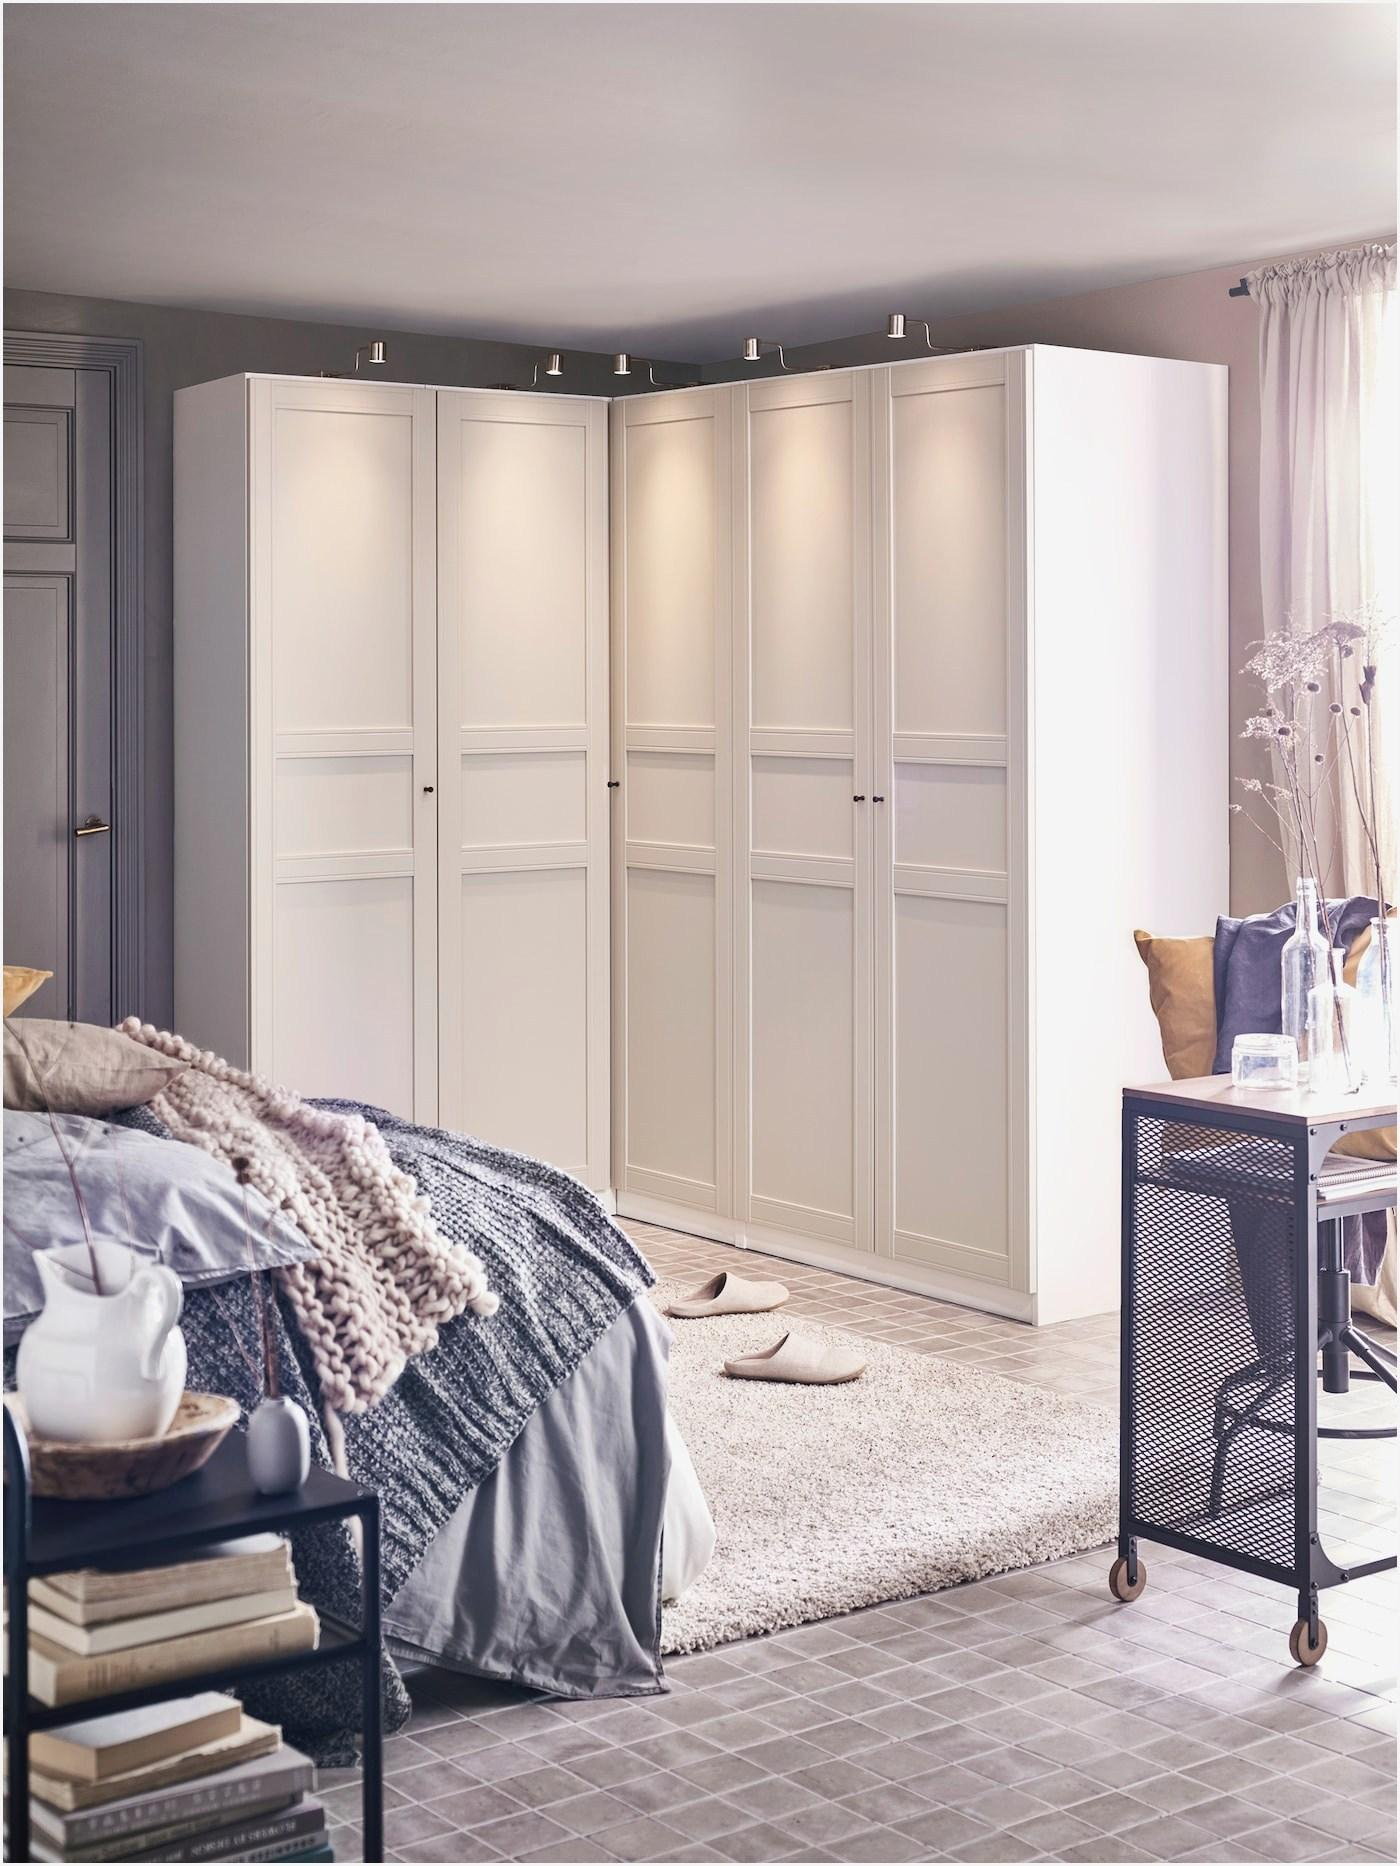 Ikea Lampen Schlafzimmer